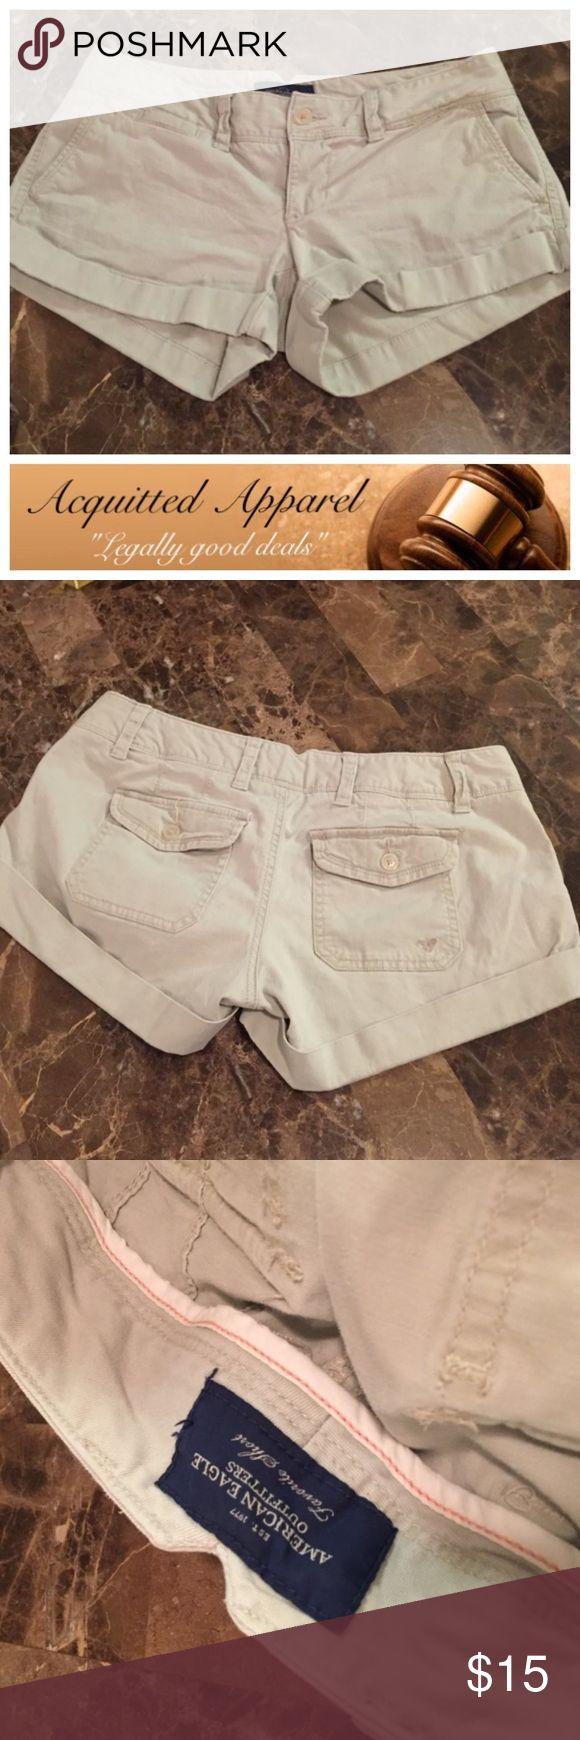 (AE) American Eagle Kahki Classic Shorts Excellent condition. Size 2. . Location 8 American Eagle Kahki Shorts American Eagle Outfitters Shorts